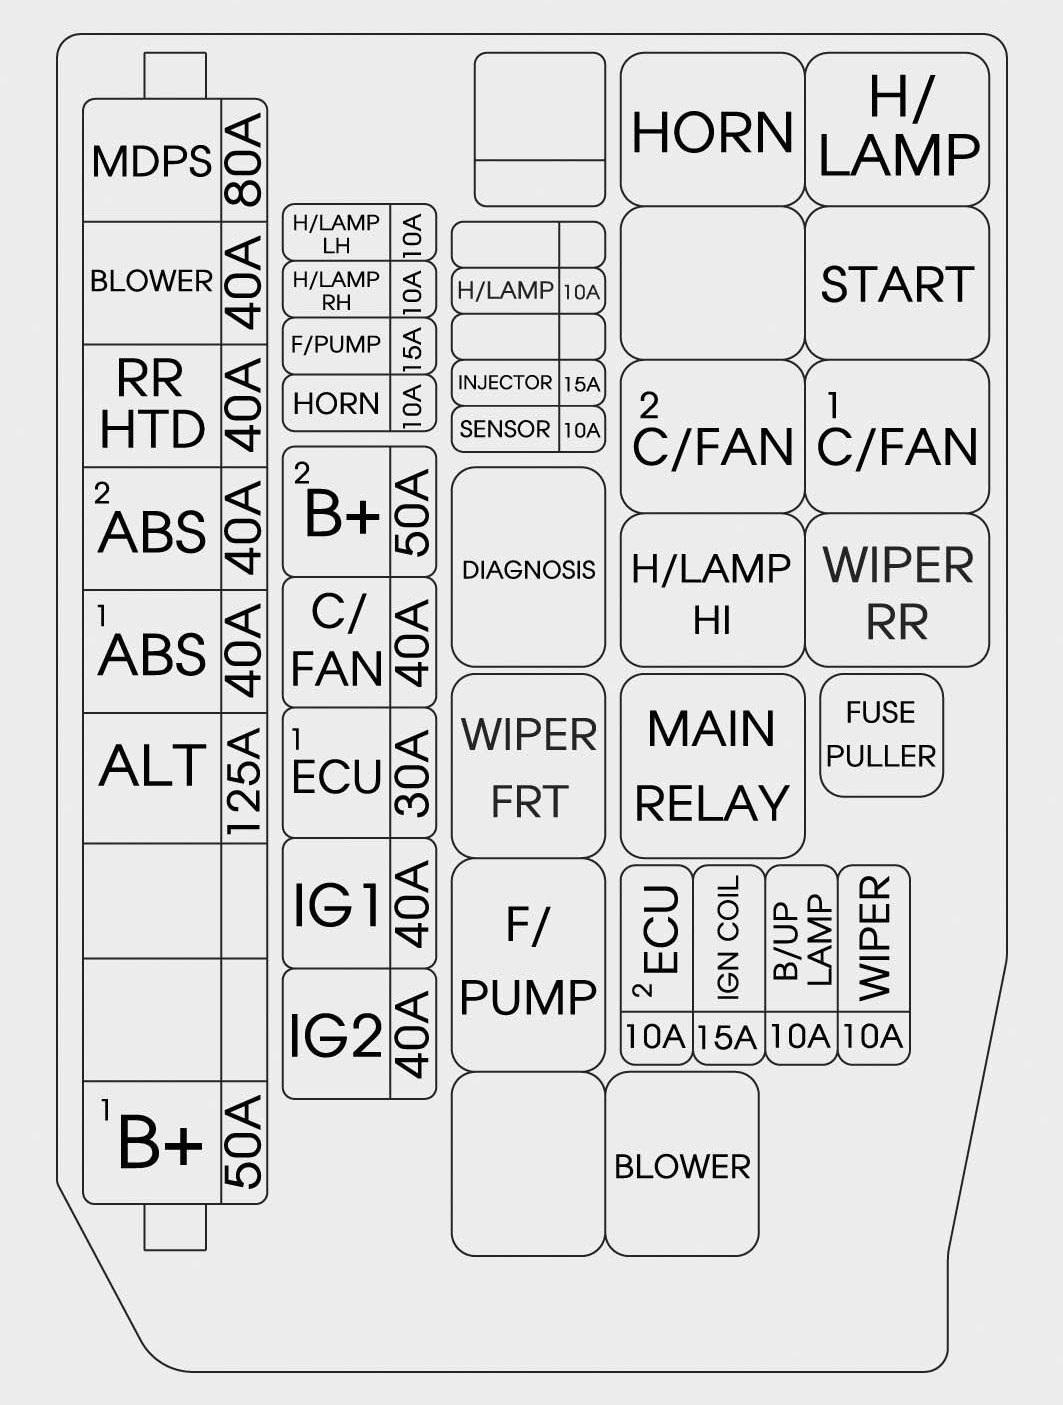 2015 Hyundai Sonata Fuse Box Everything About Wiring Diagram 2006 Elantra Ix35 Library Rh 66 Muehlwald De 2009